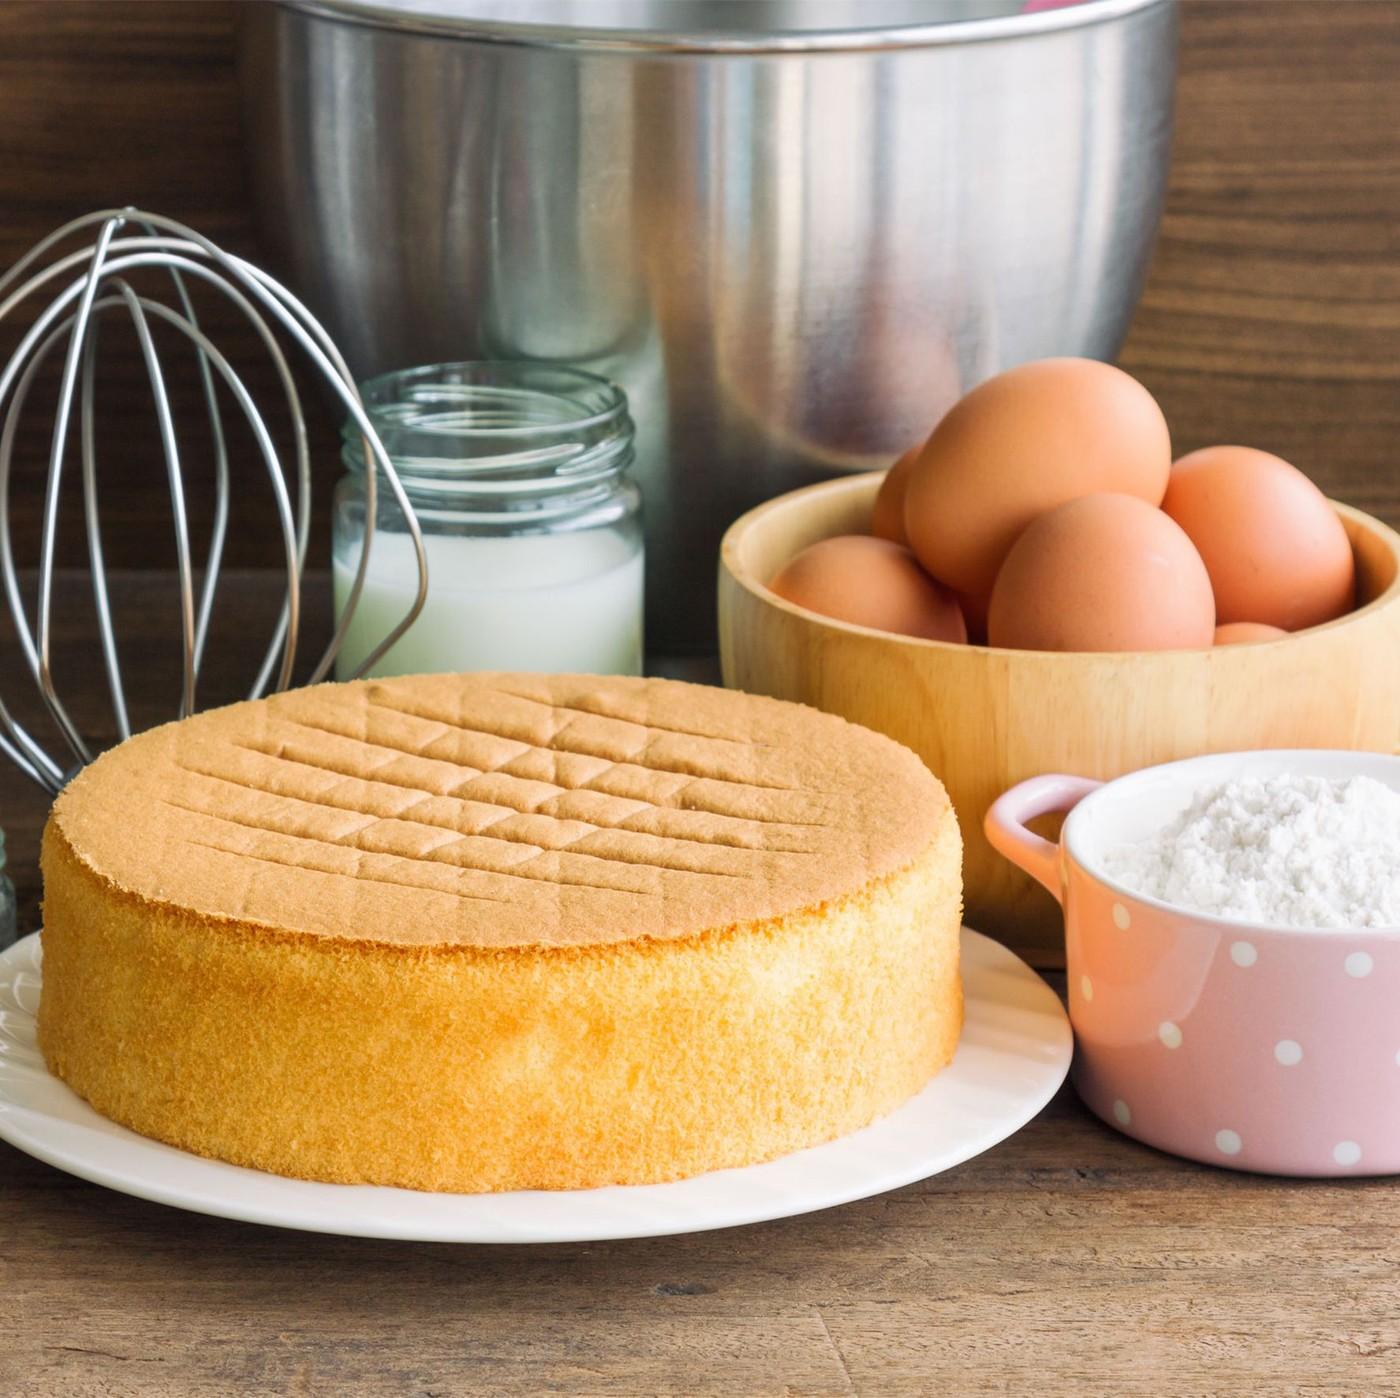 receta de Harina mix para dulces sin gluten